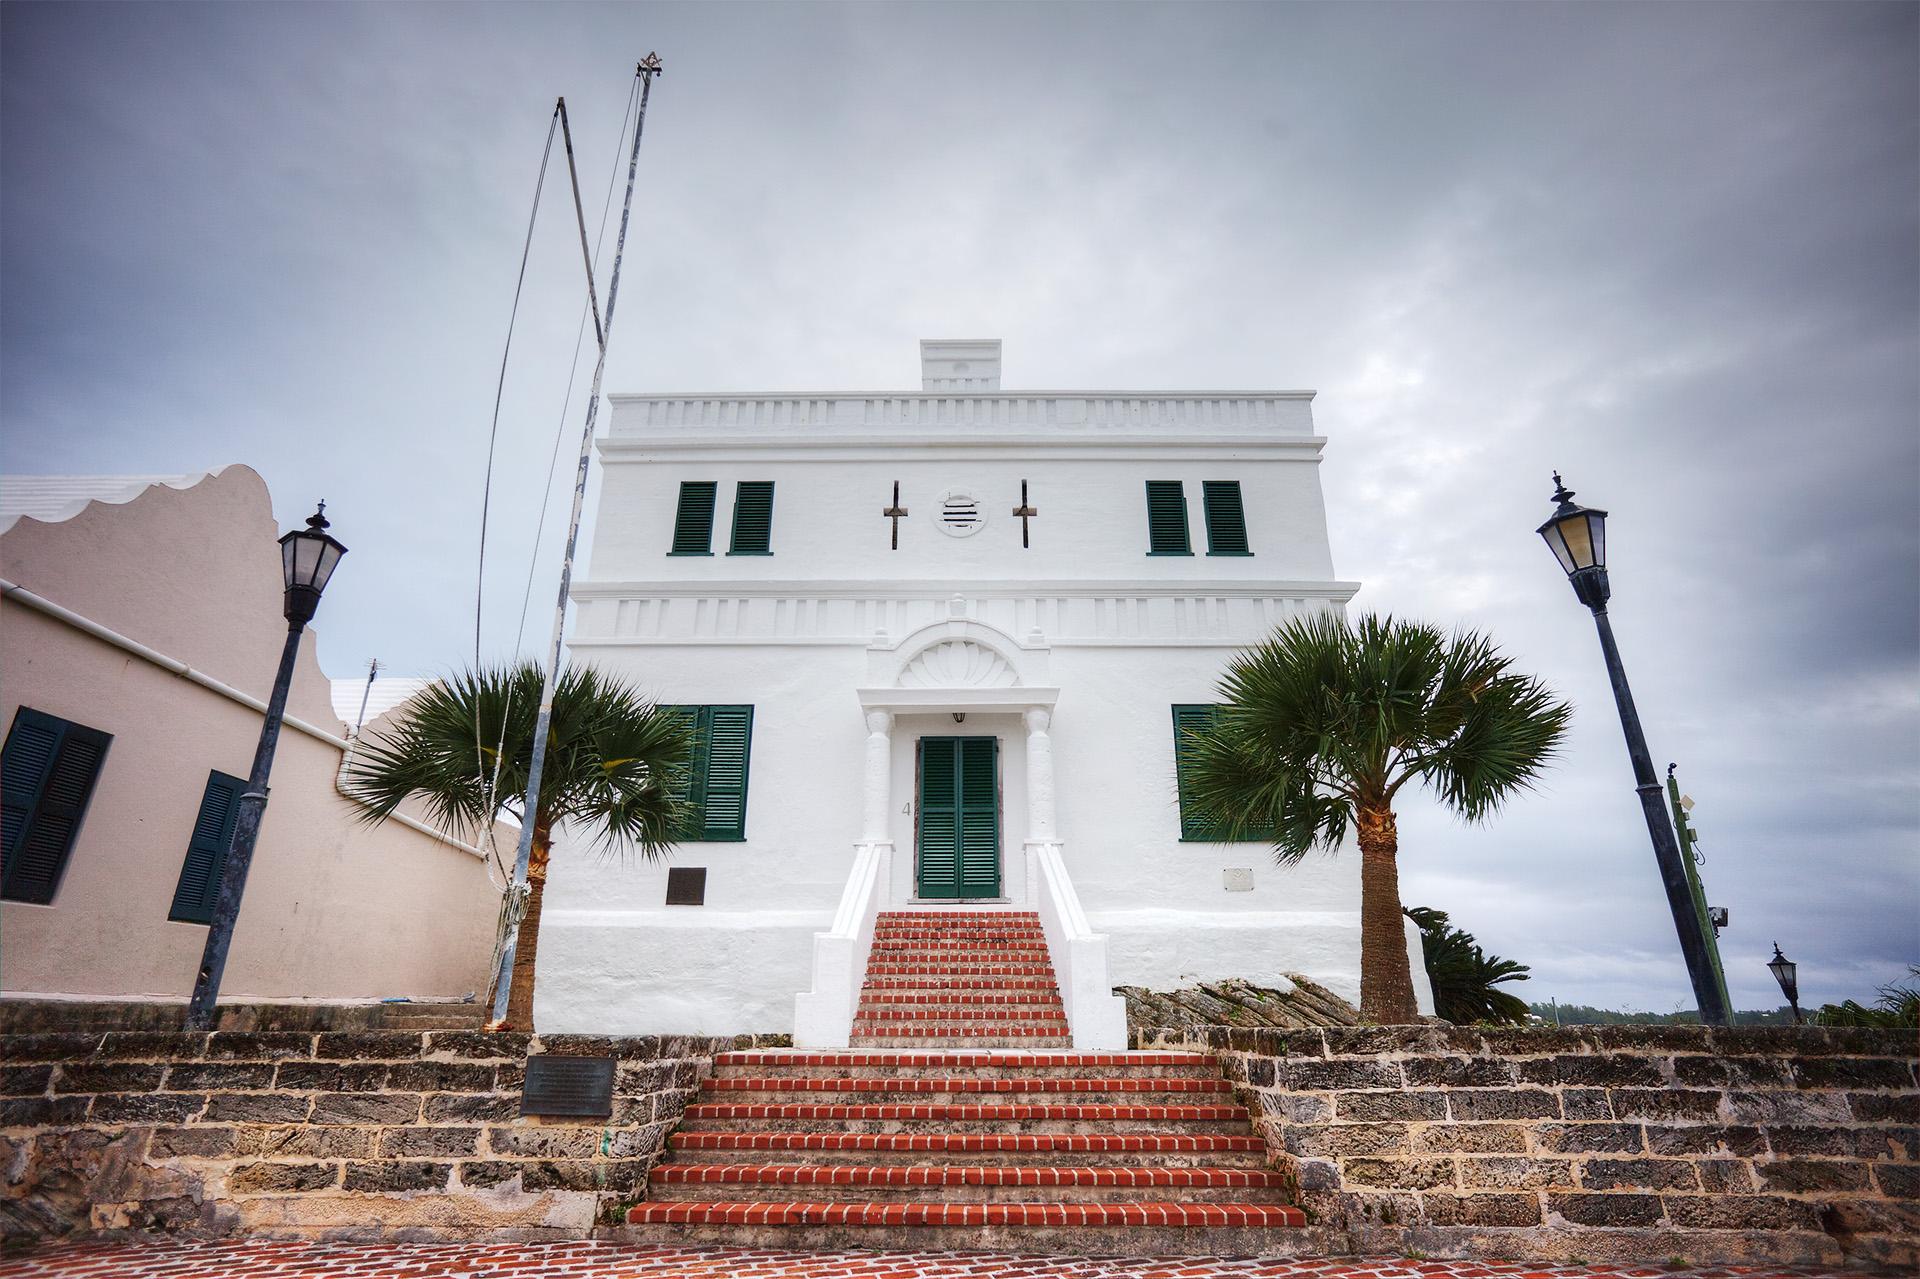 State House, St George, Bermuda.